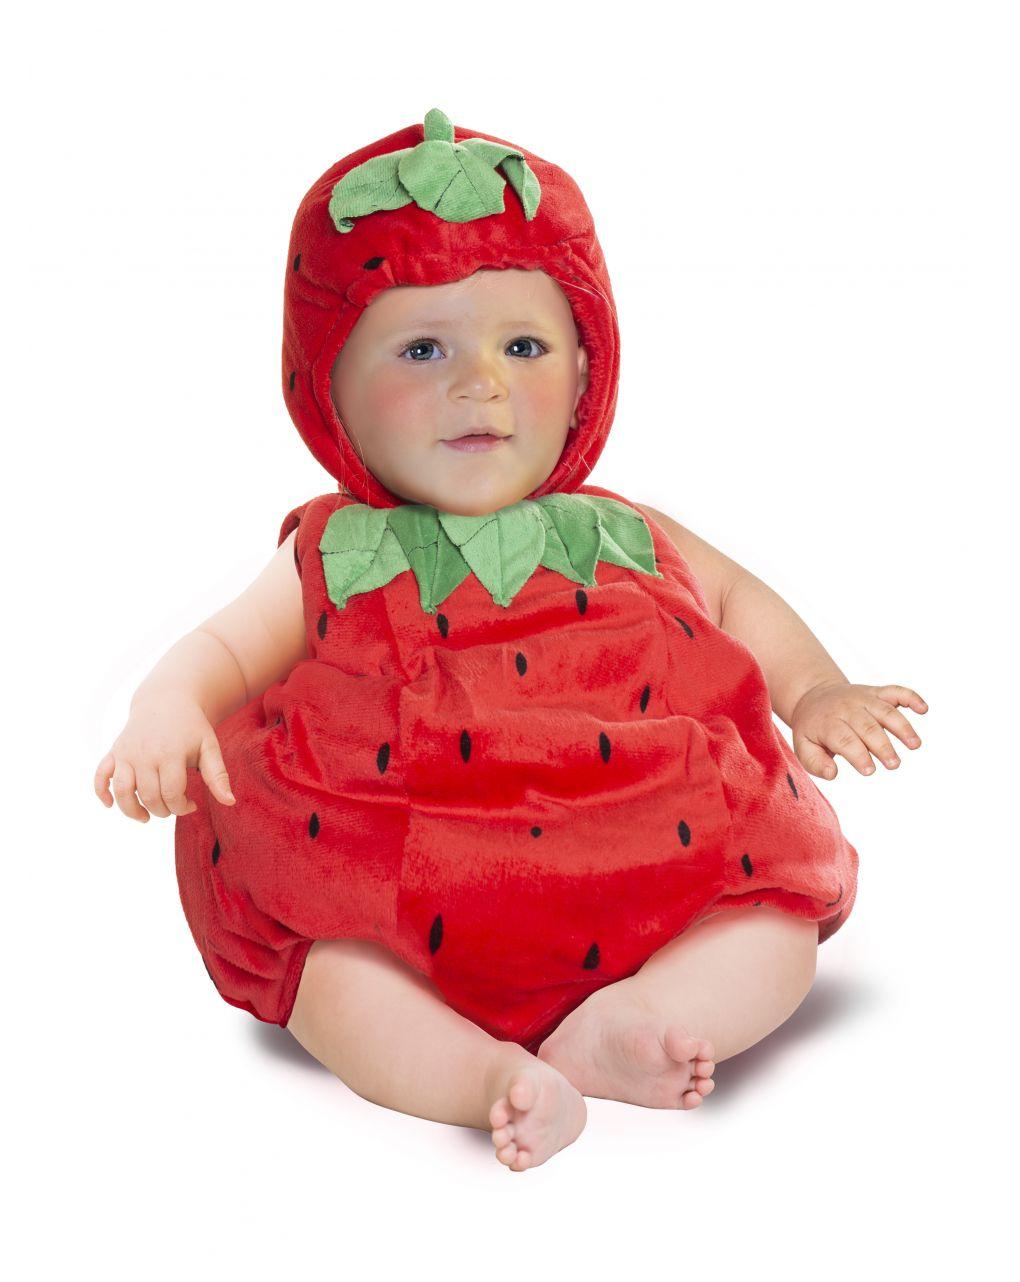 Costume fragolina baby 12 mesi - Carnaval Queen